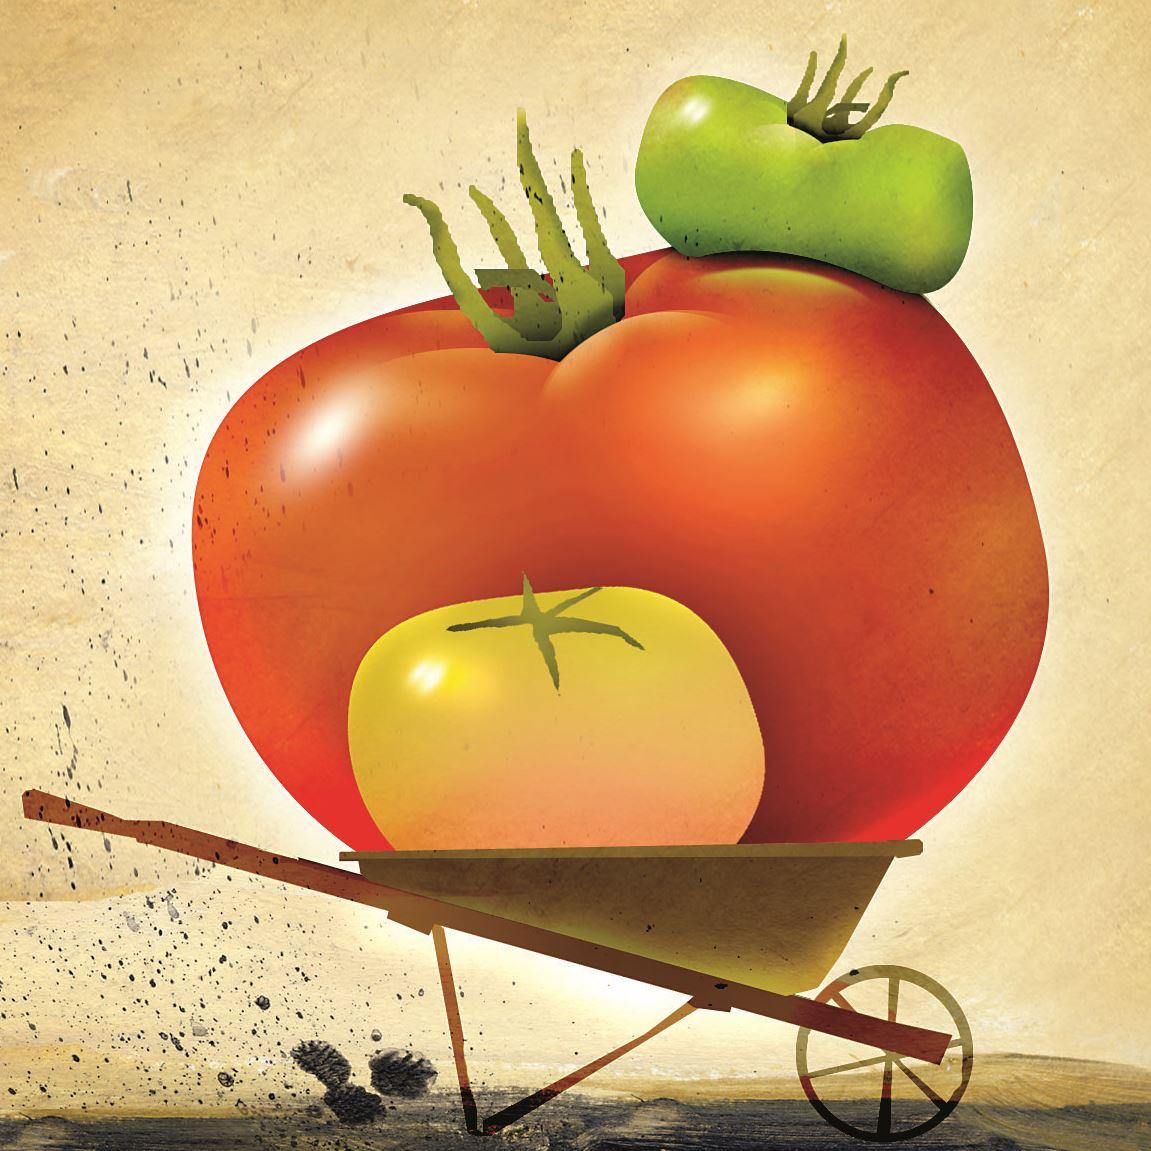 2_Tomatoes0823 All that rain has slowed the tomato season some.